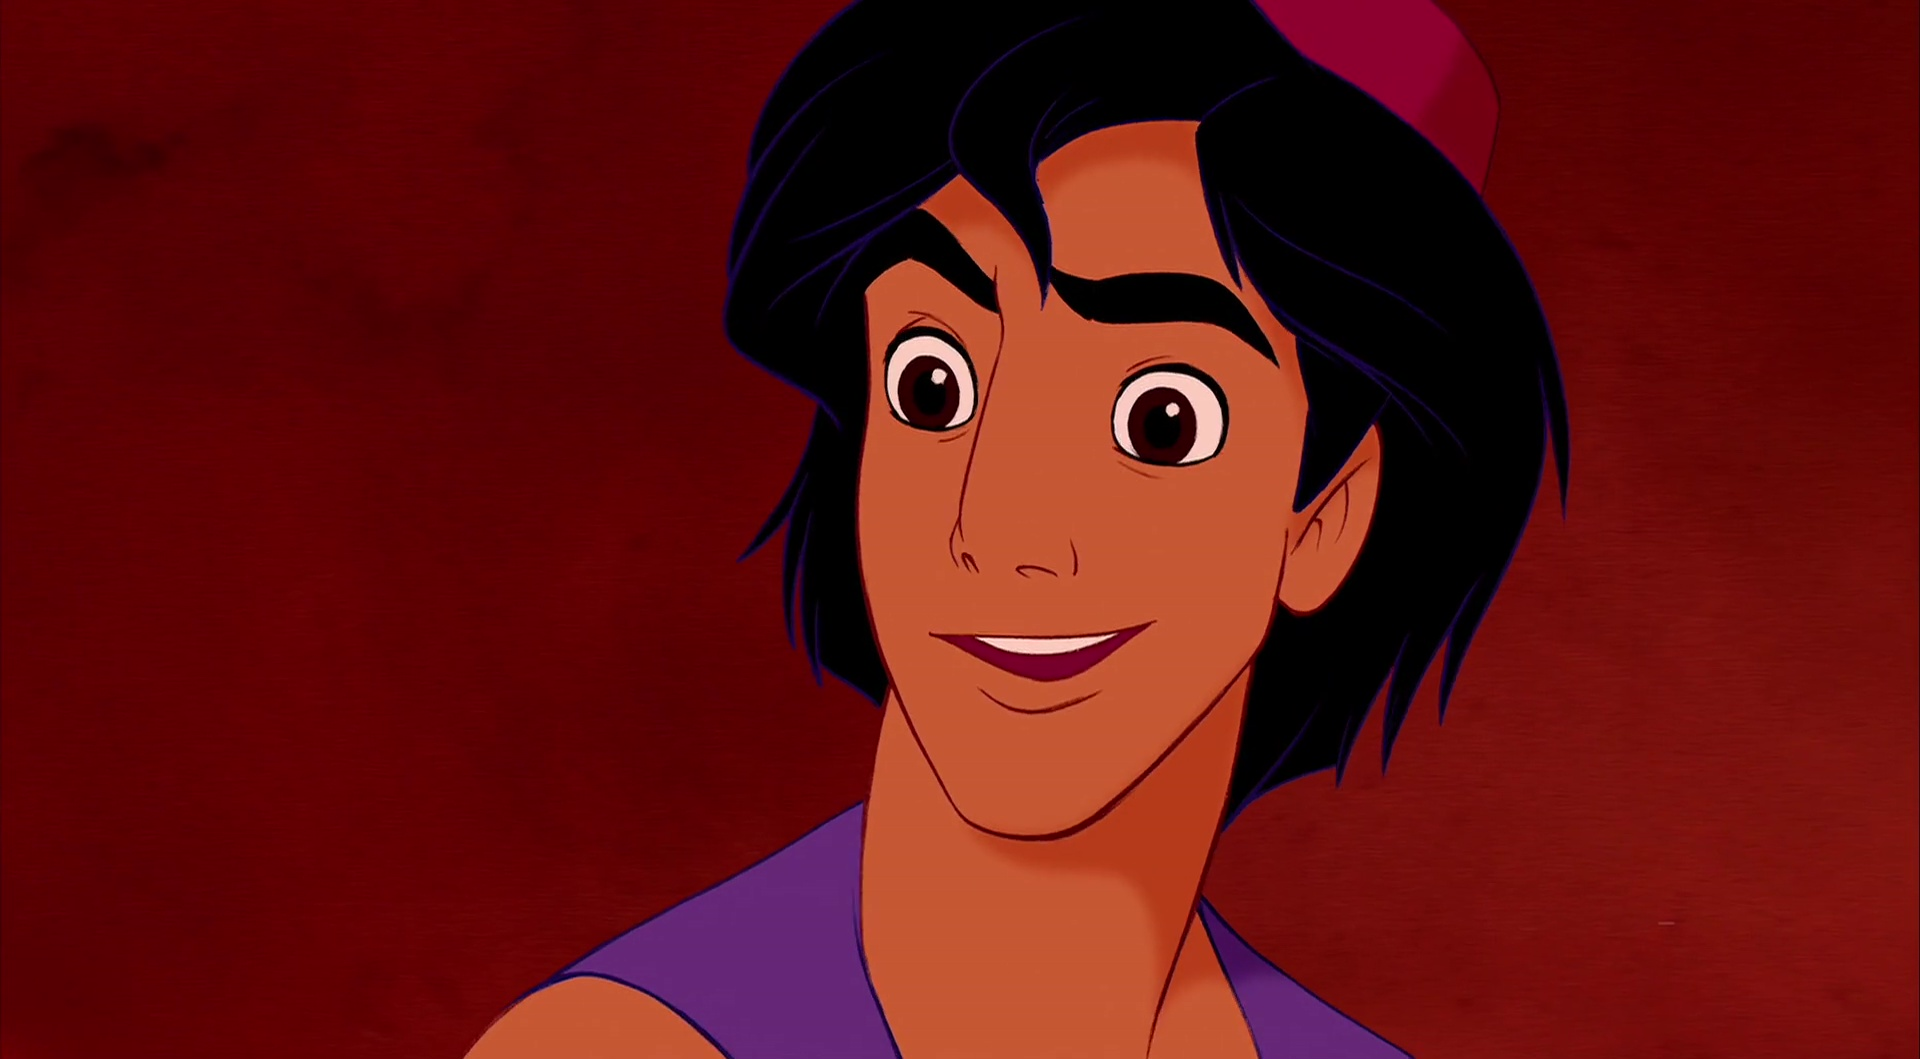 Aladdin (personnage)